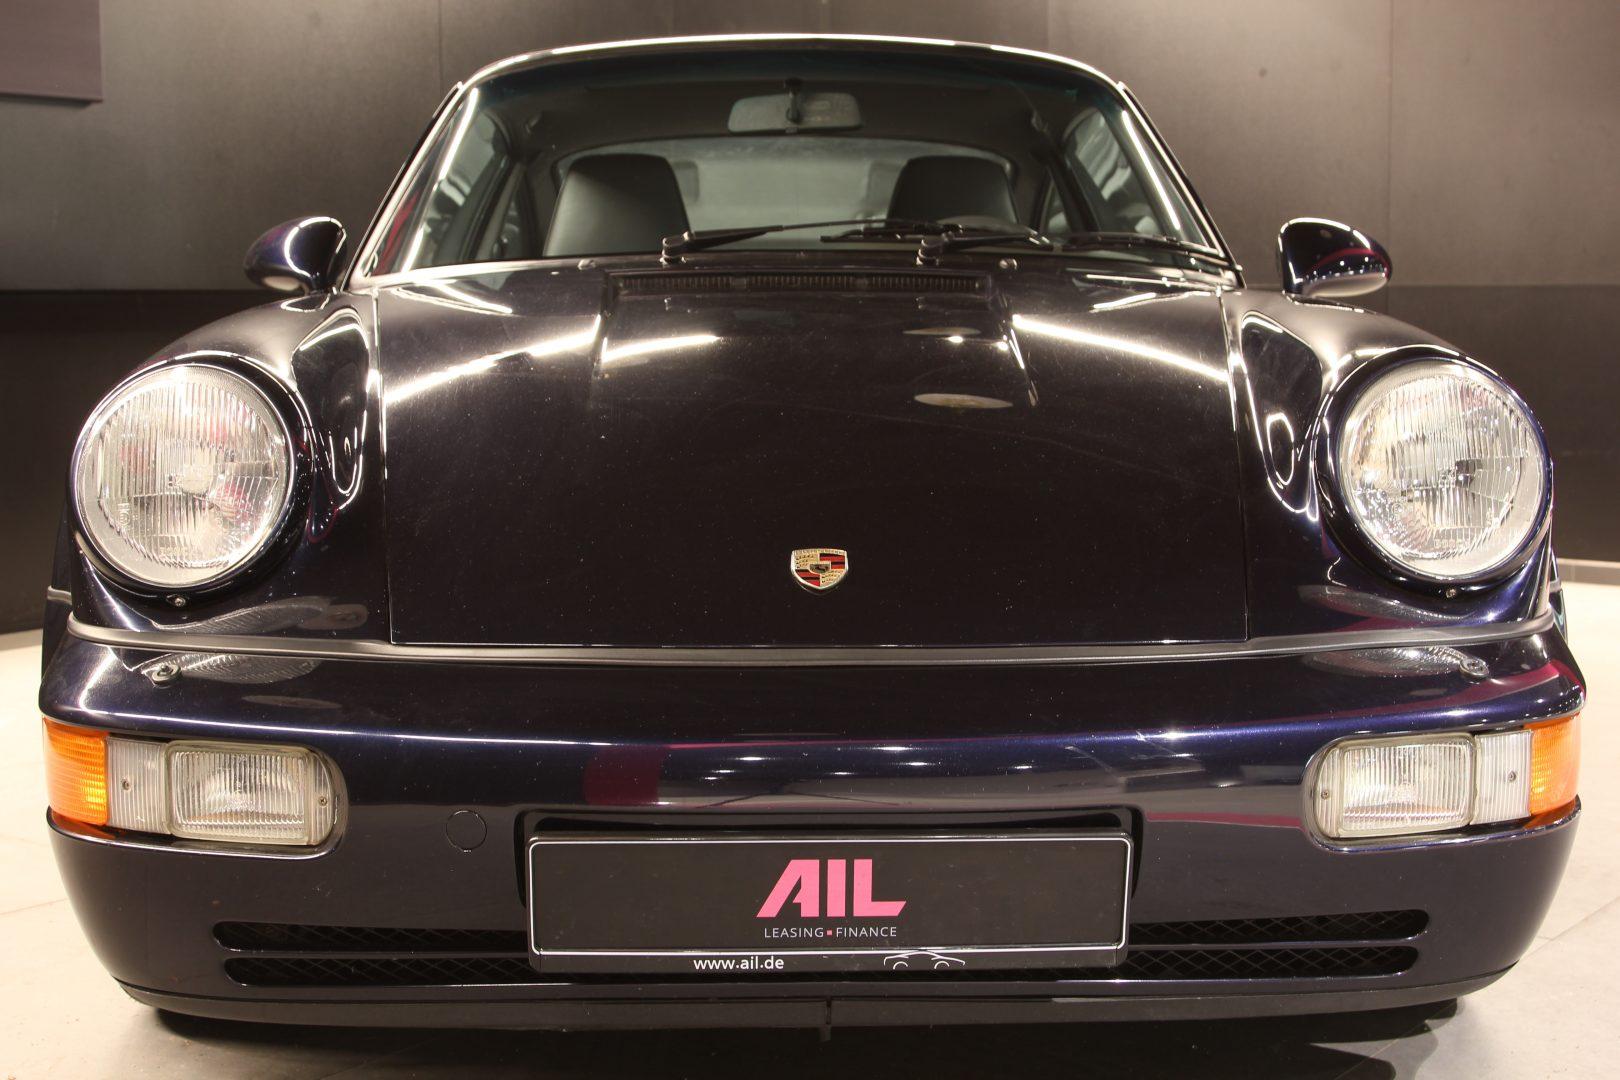 AIL Porsche 964 Turbo 3,3 10